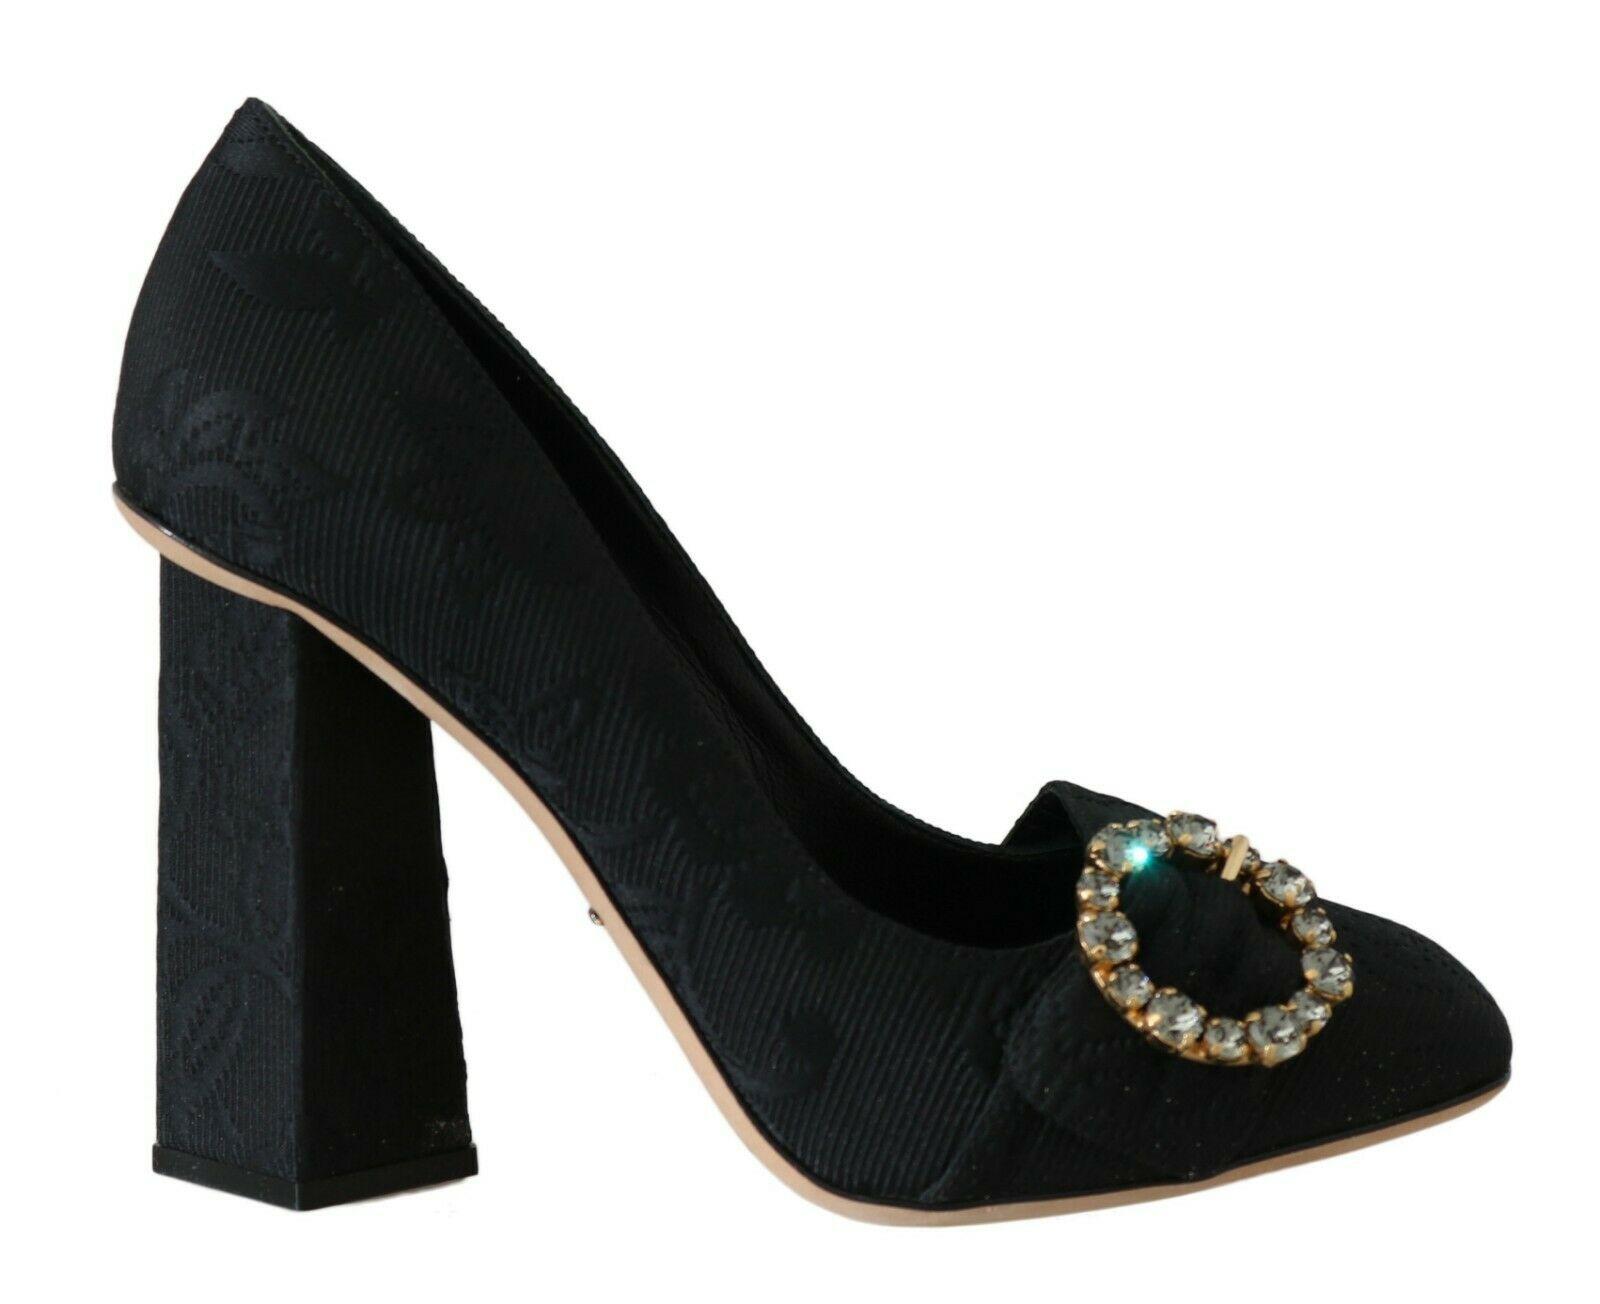 Dolce & Gabbana Women's Jacquard Floral Crystal Pumps Black LA5659 - EU36/US5.5